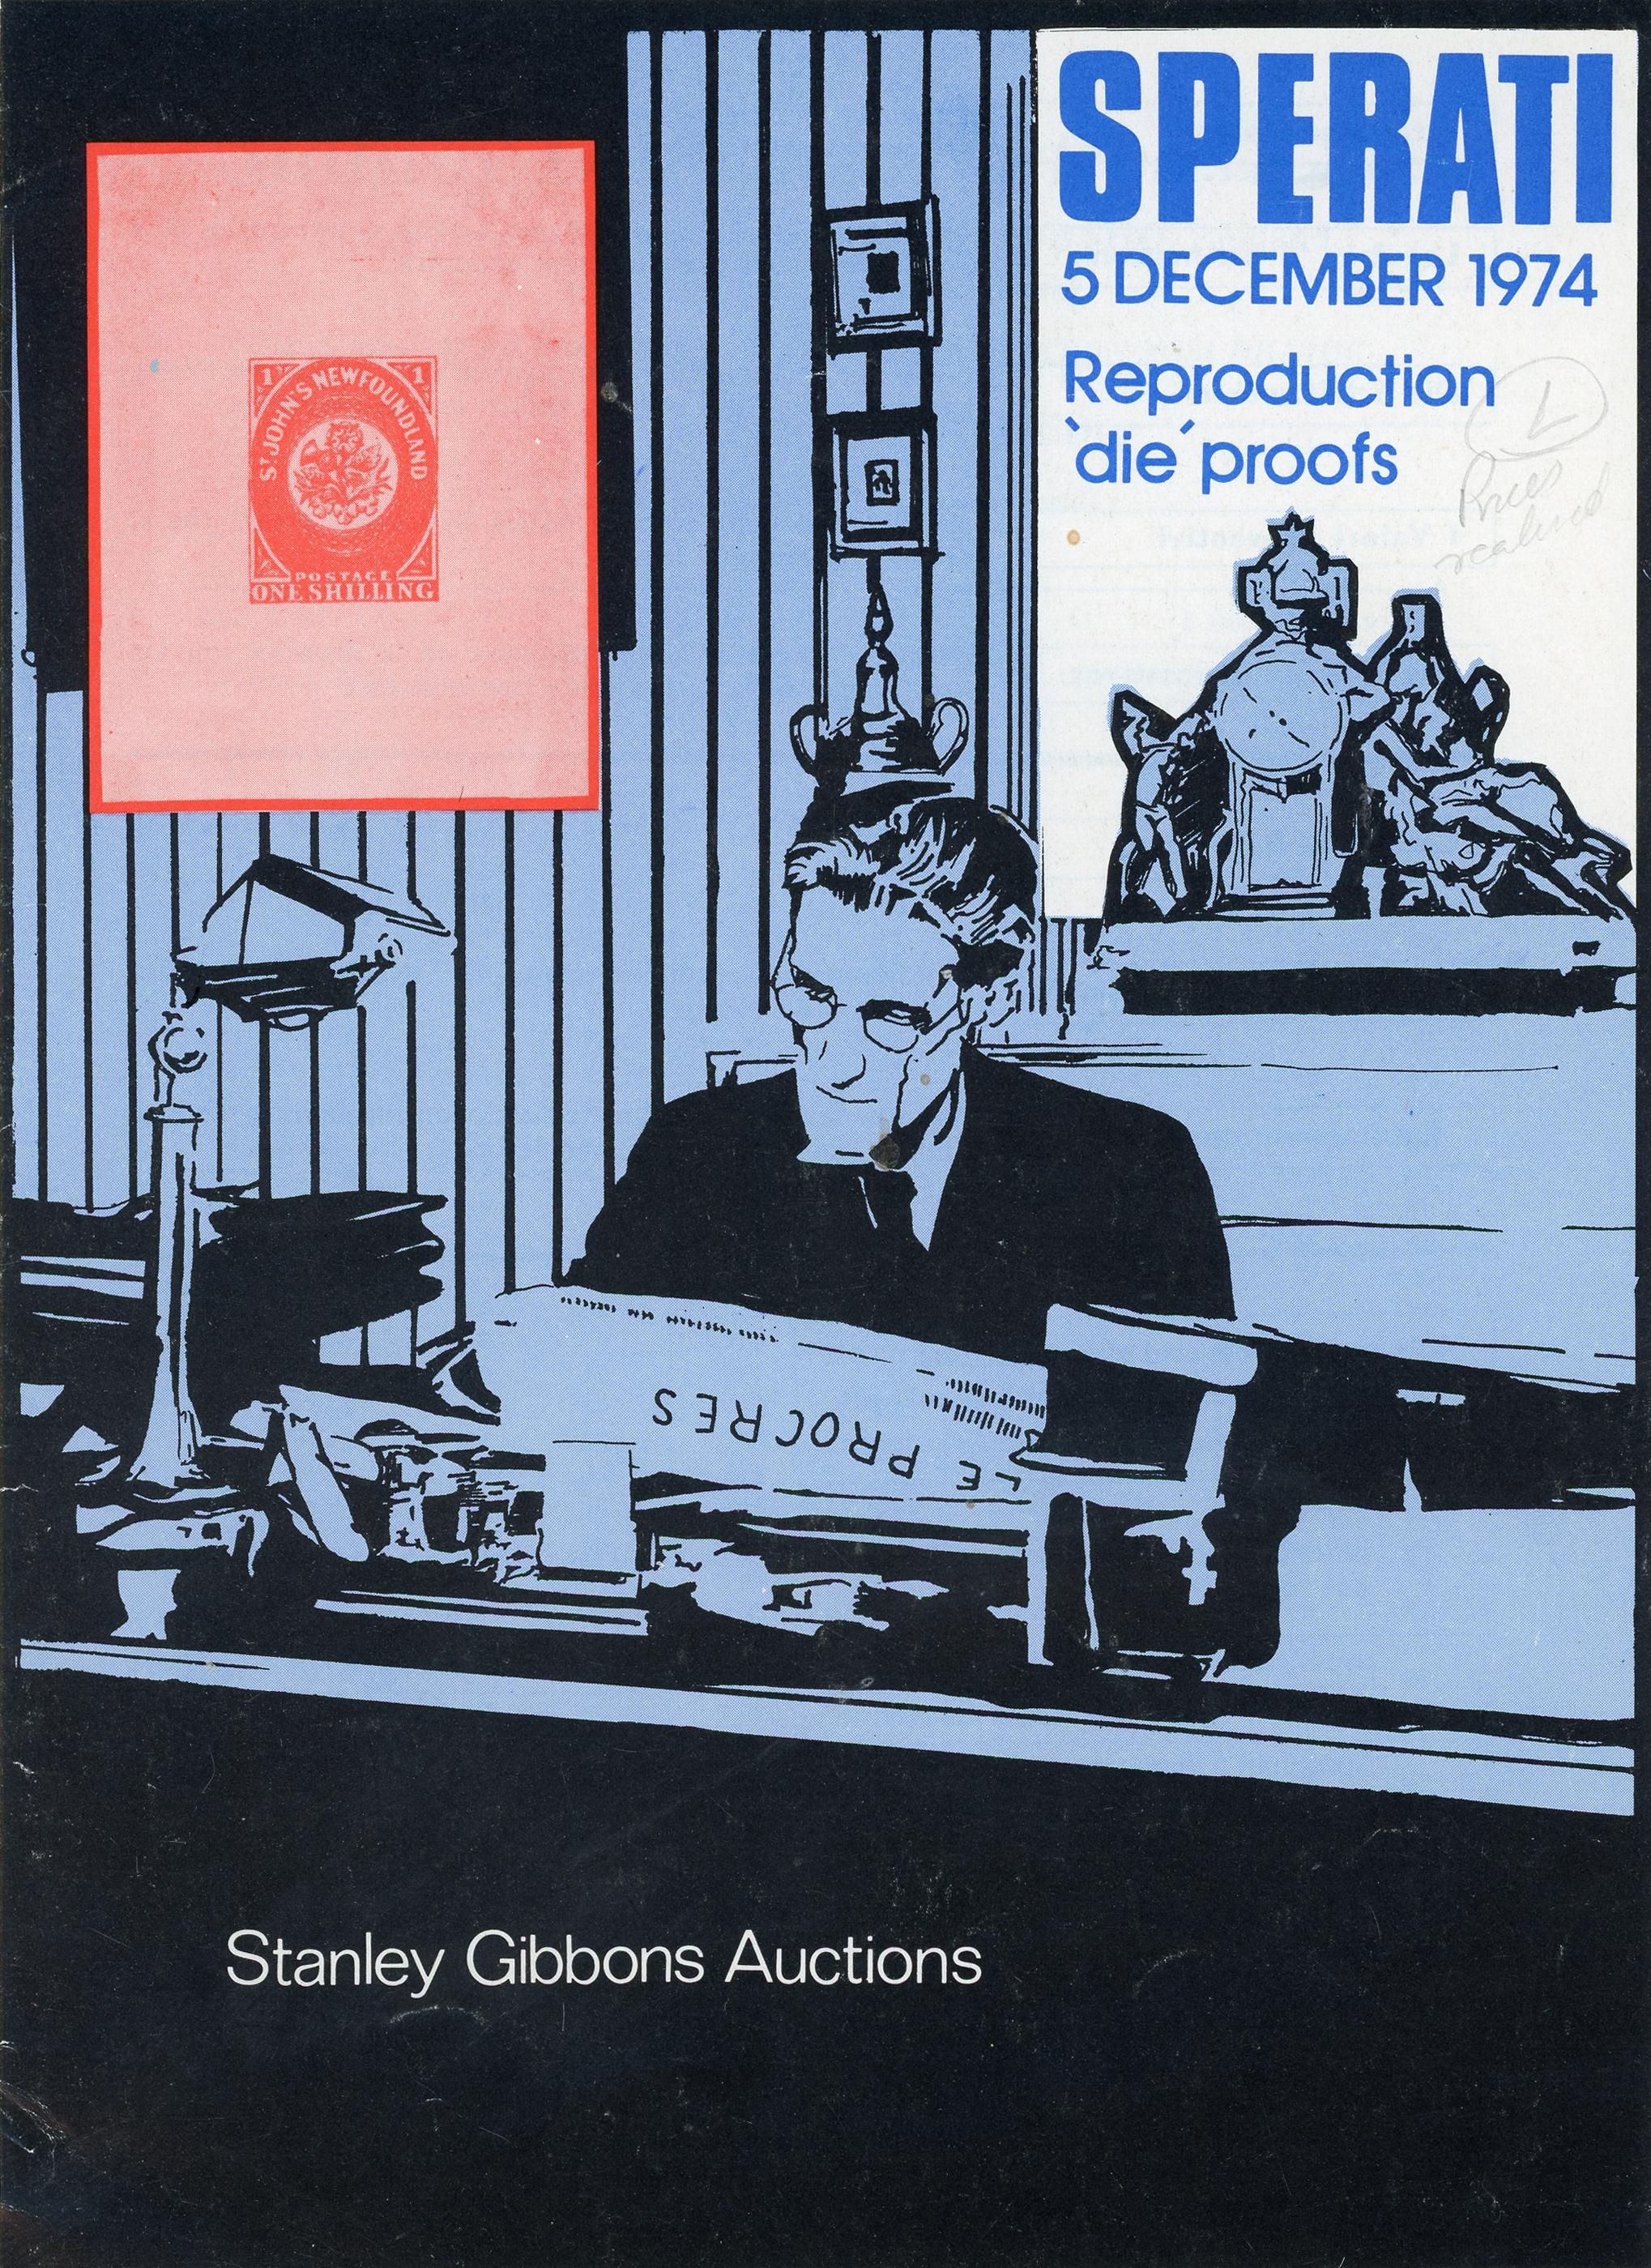 Sperati-Sonderkatalog, Stanley Gibbons, 1974